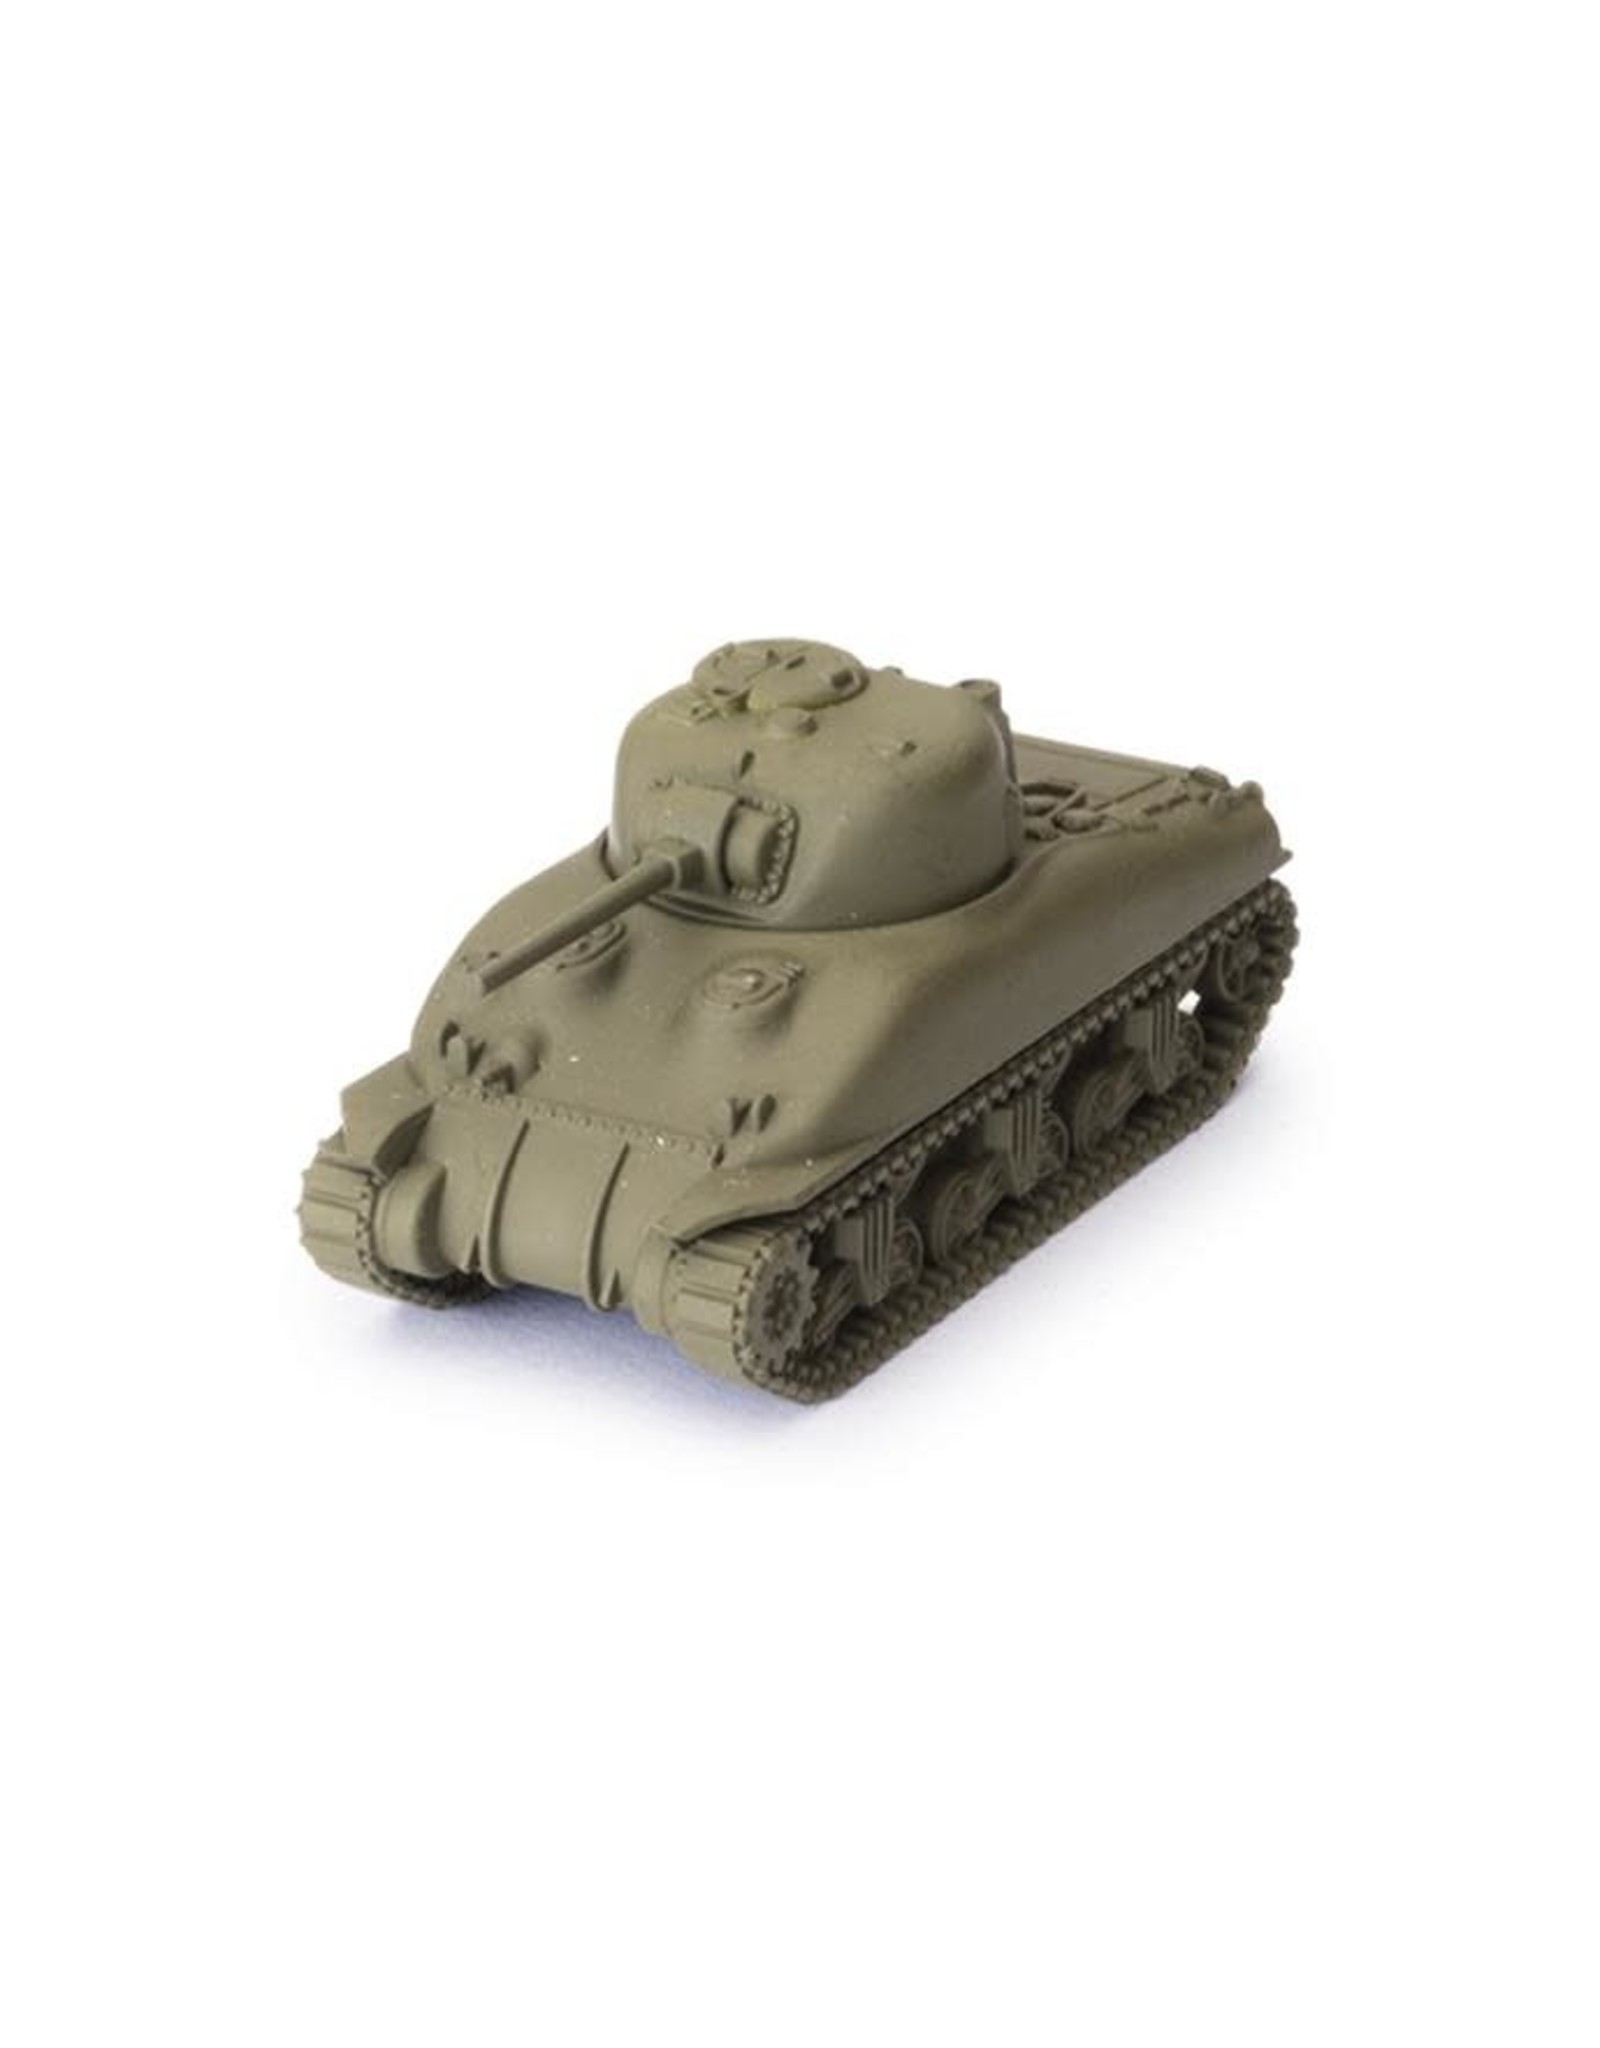 GaleForce nine World of Tanks Expansion - (M4A1 75mm Sherman)